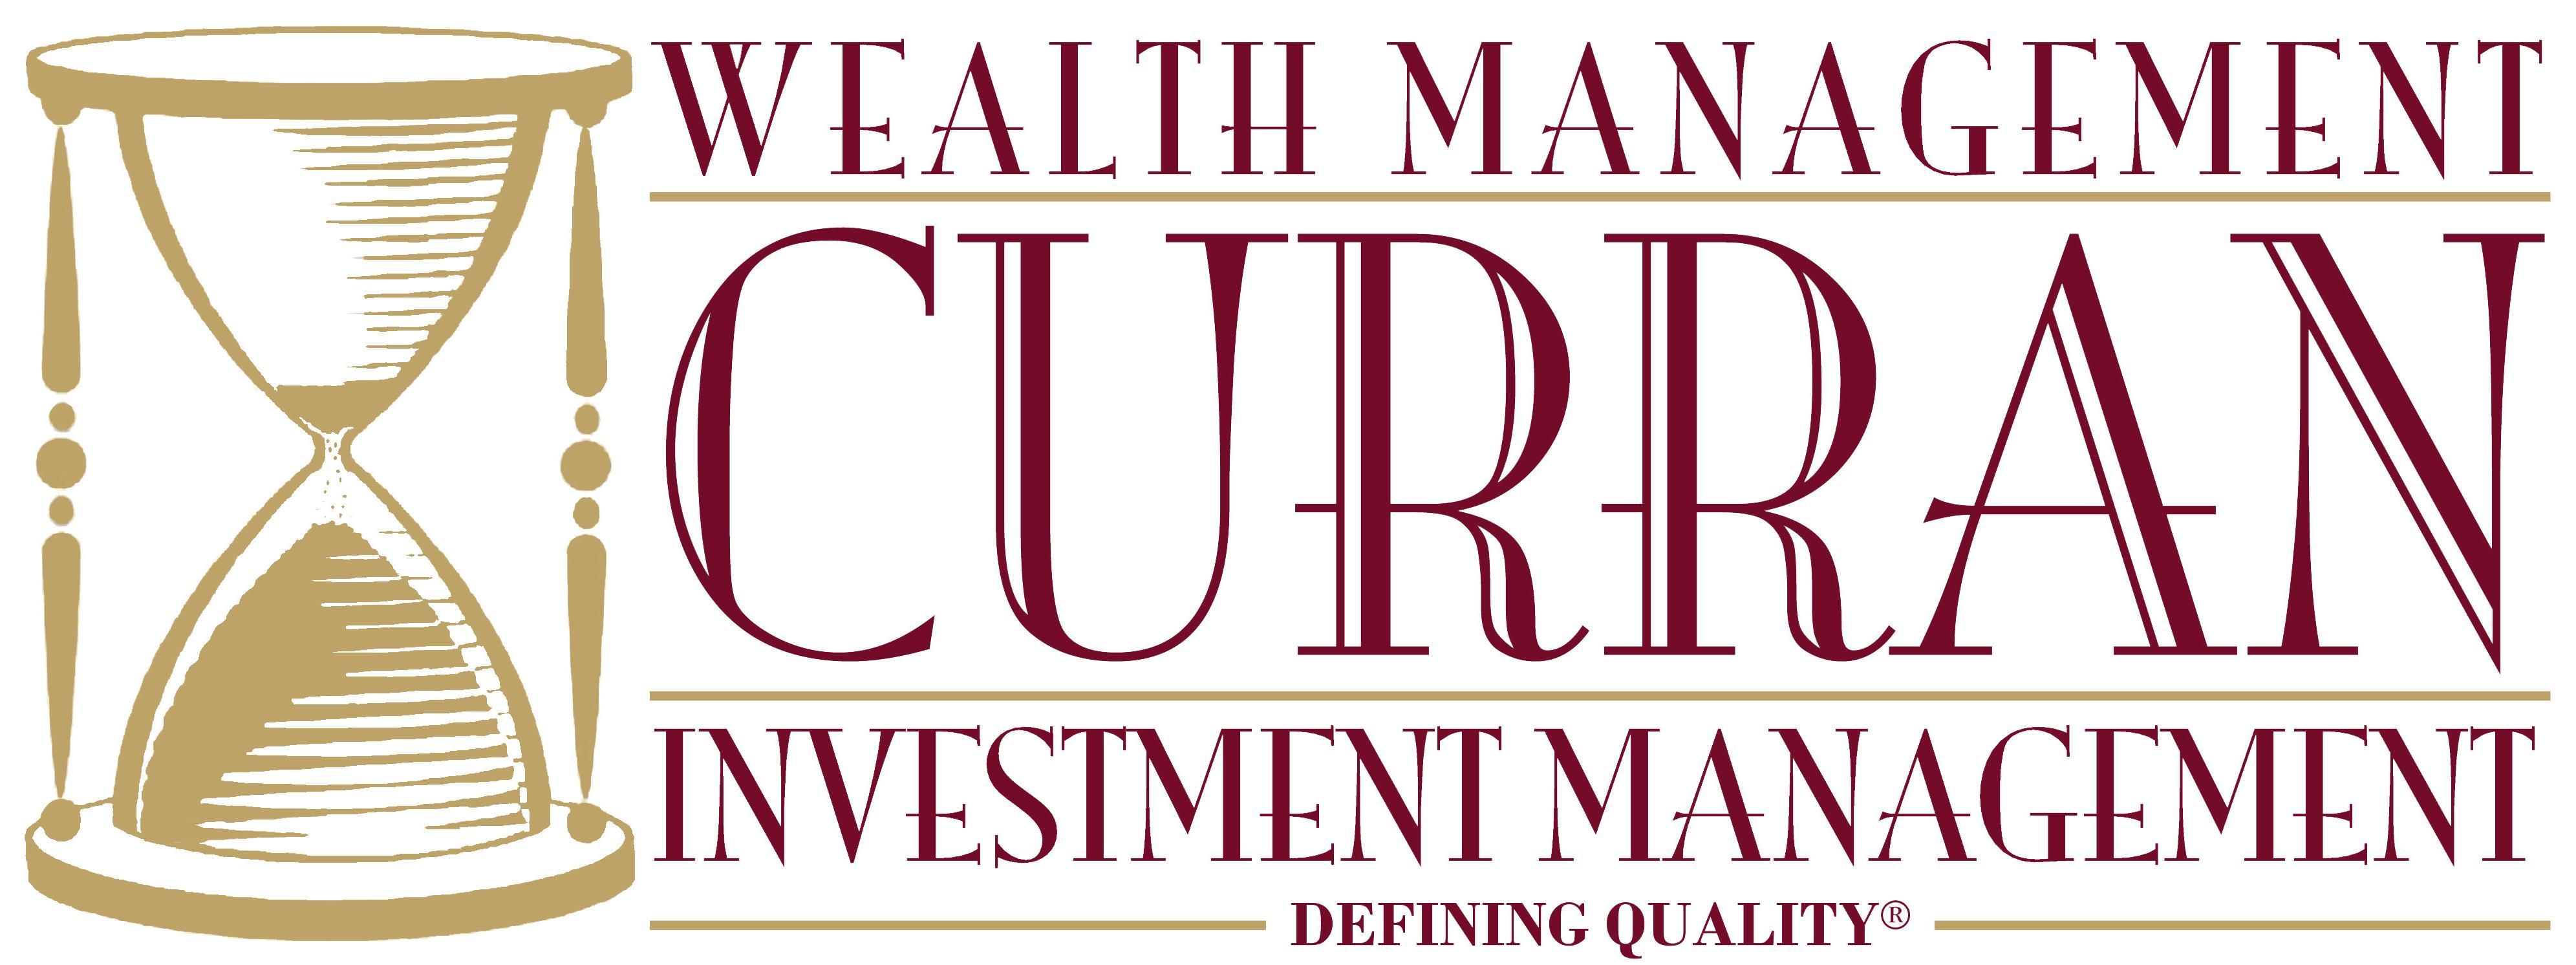 Curran LLC